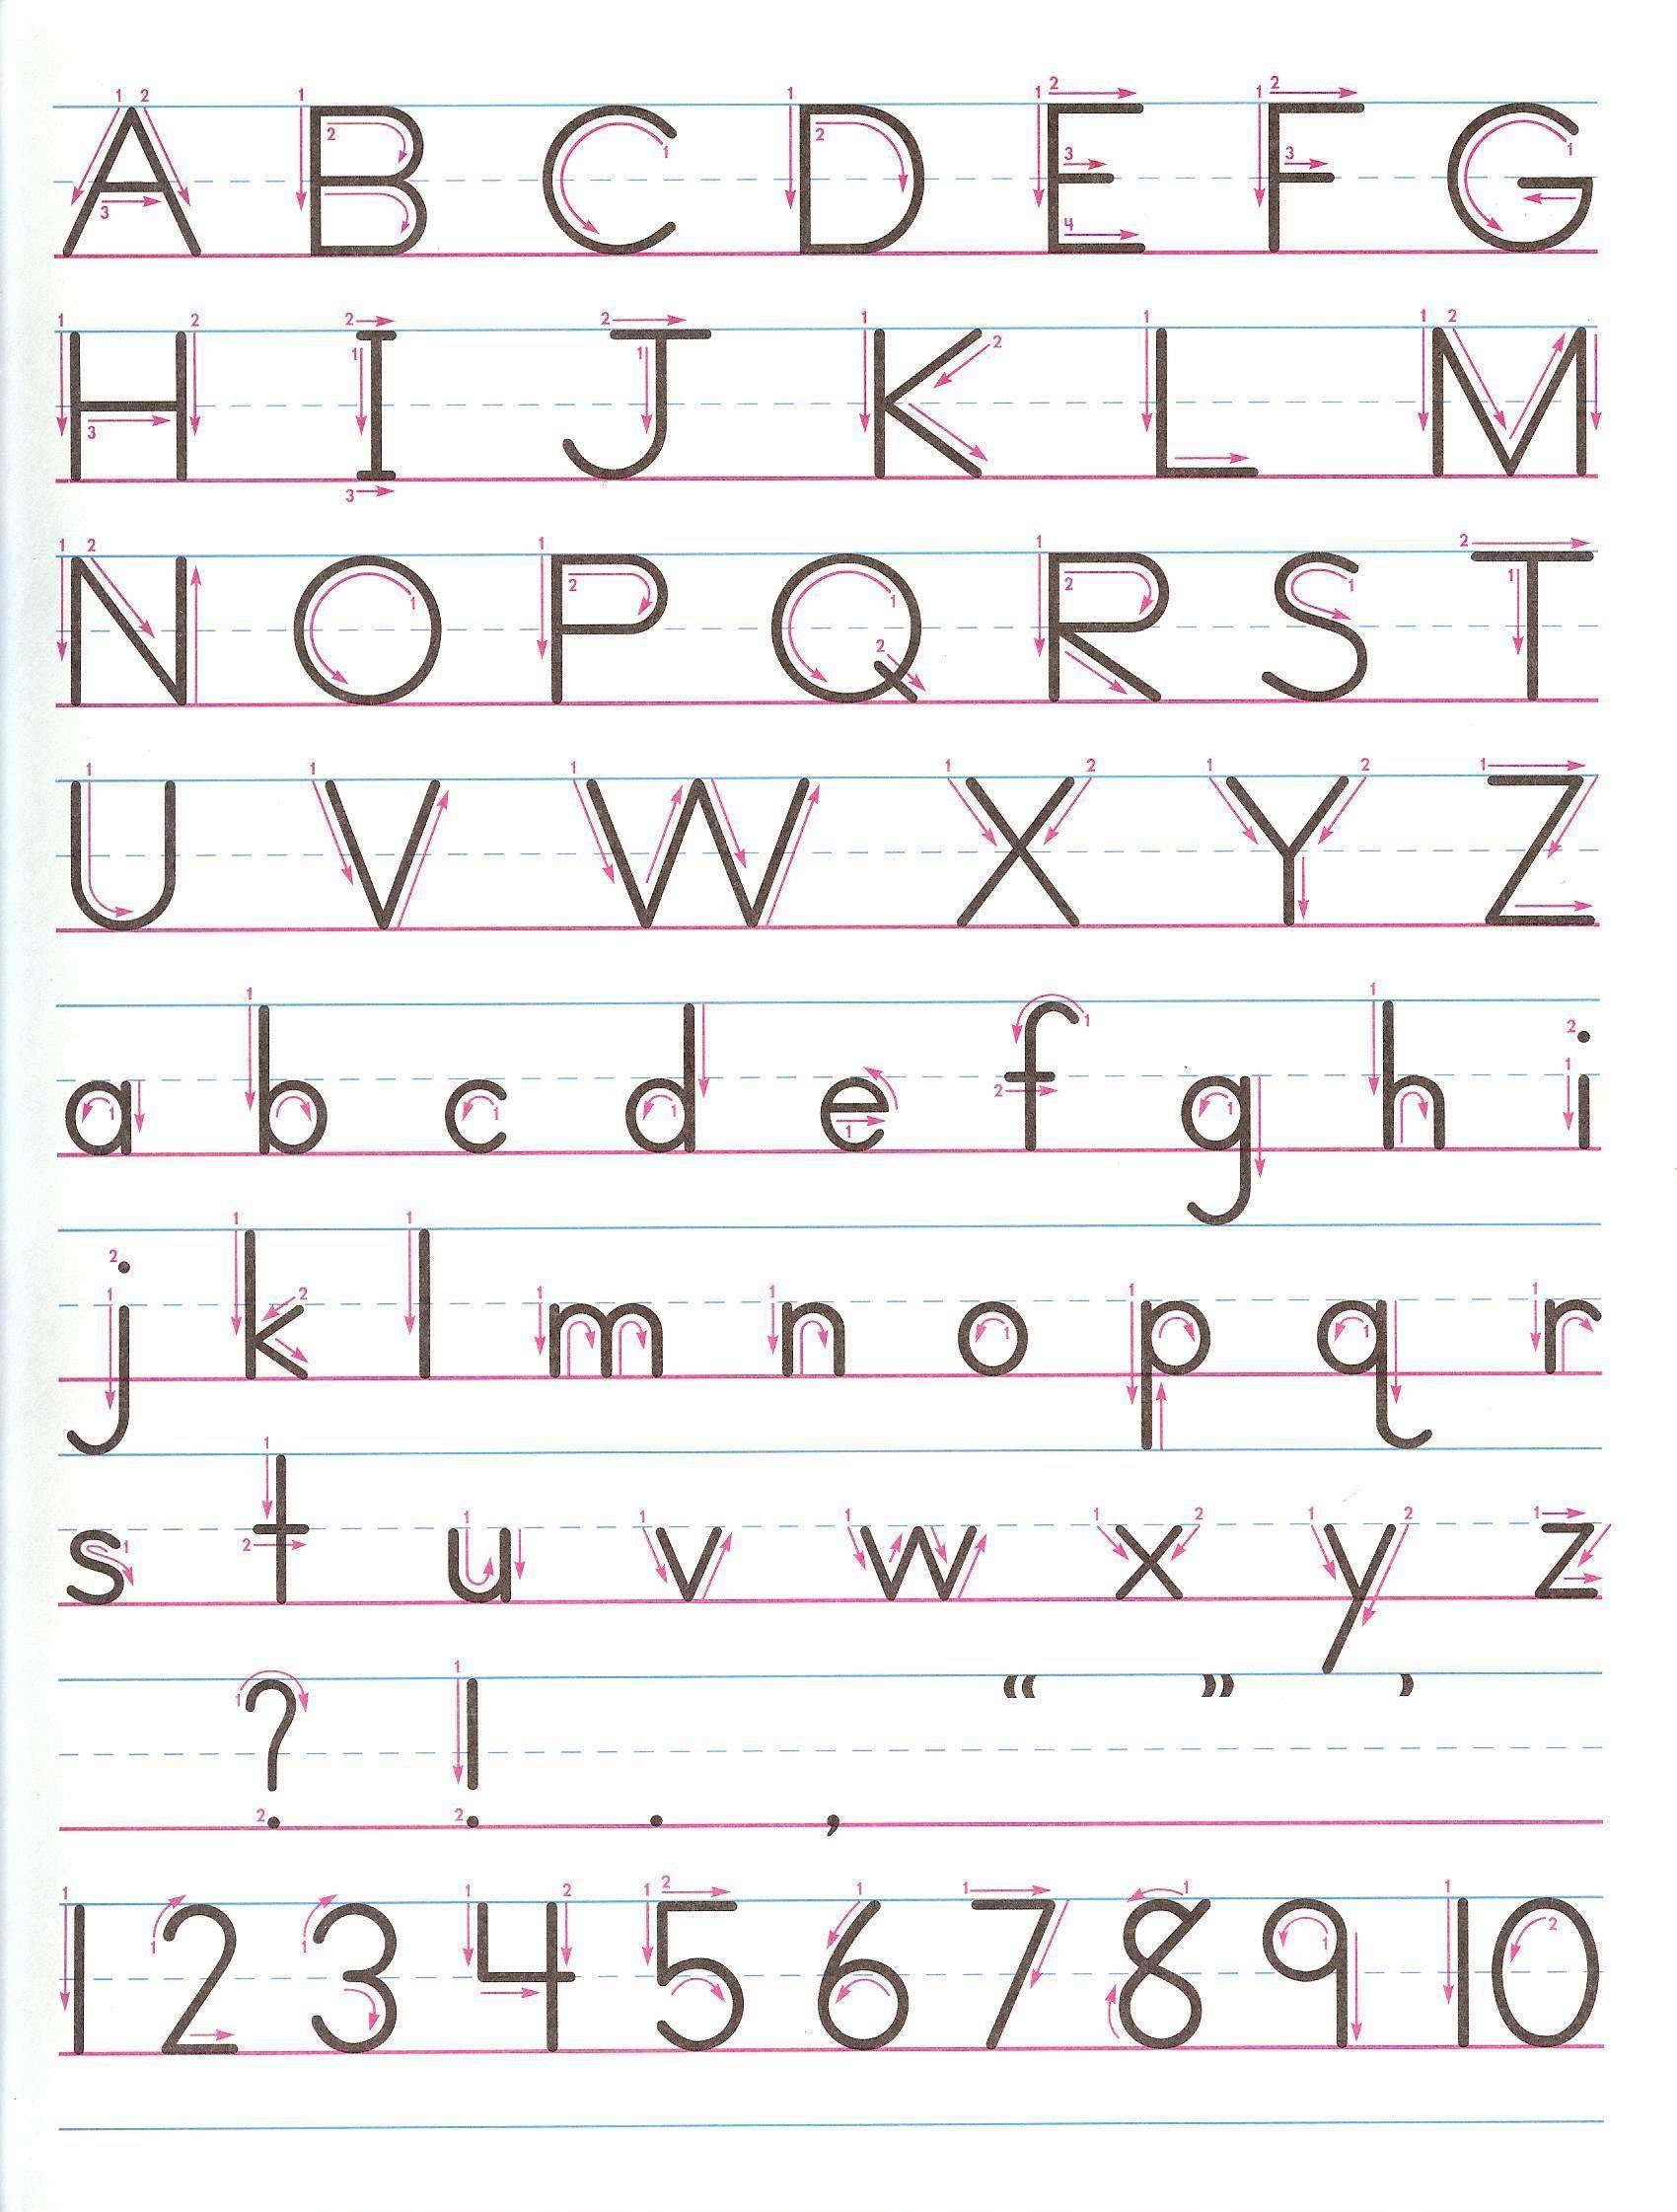 Zaner-Bloser Handwriting Chart Printable | zaner-bloser ...